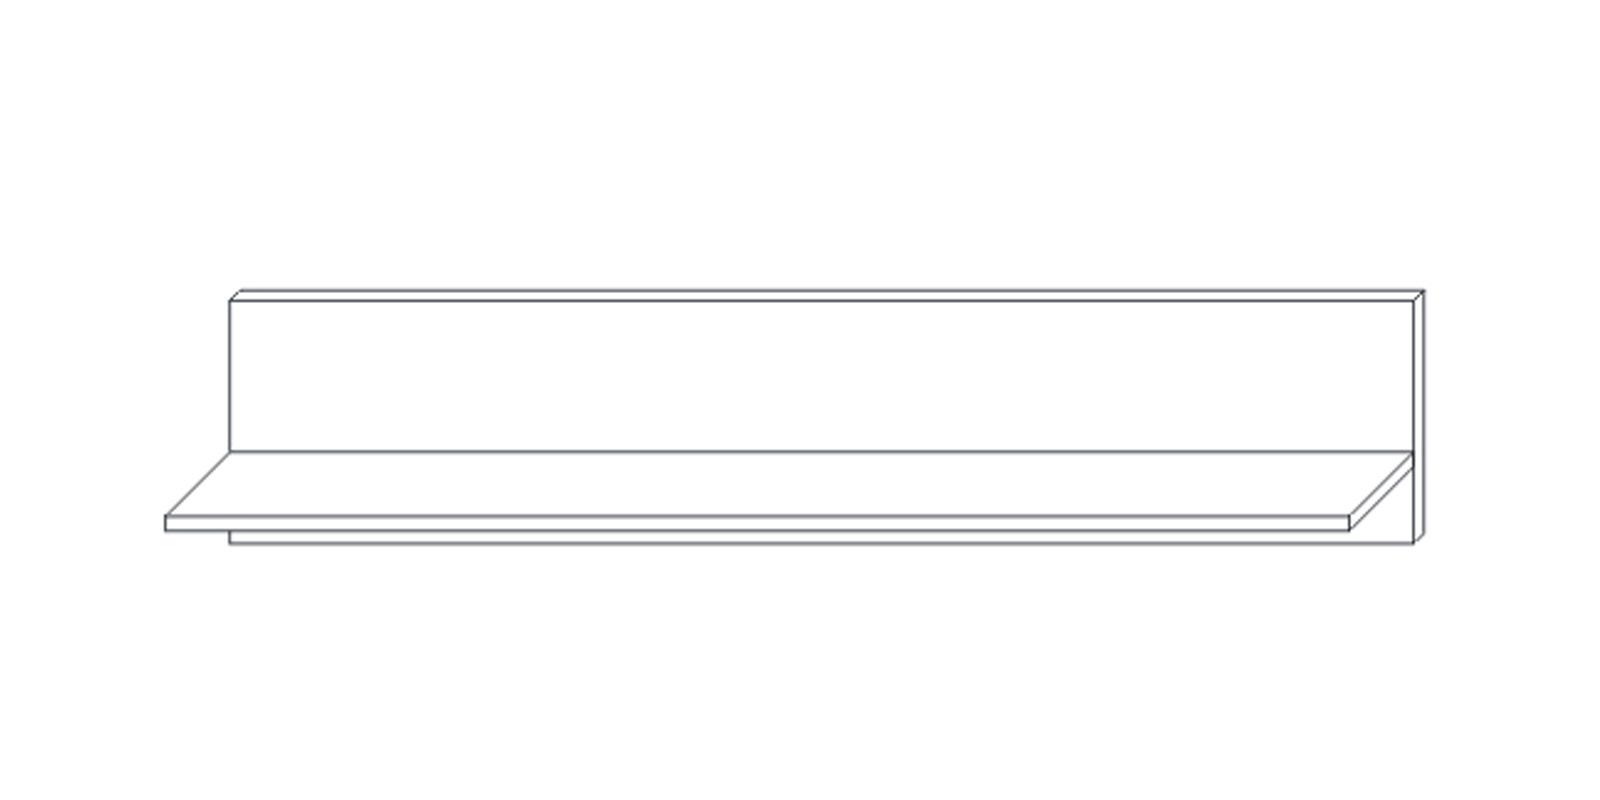 Полка навесная 1 1300 «Сиена» Кураж